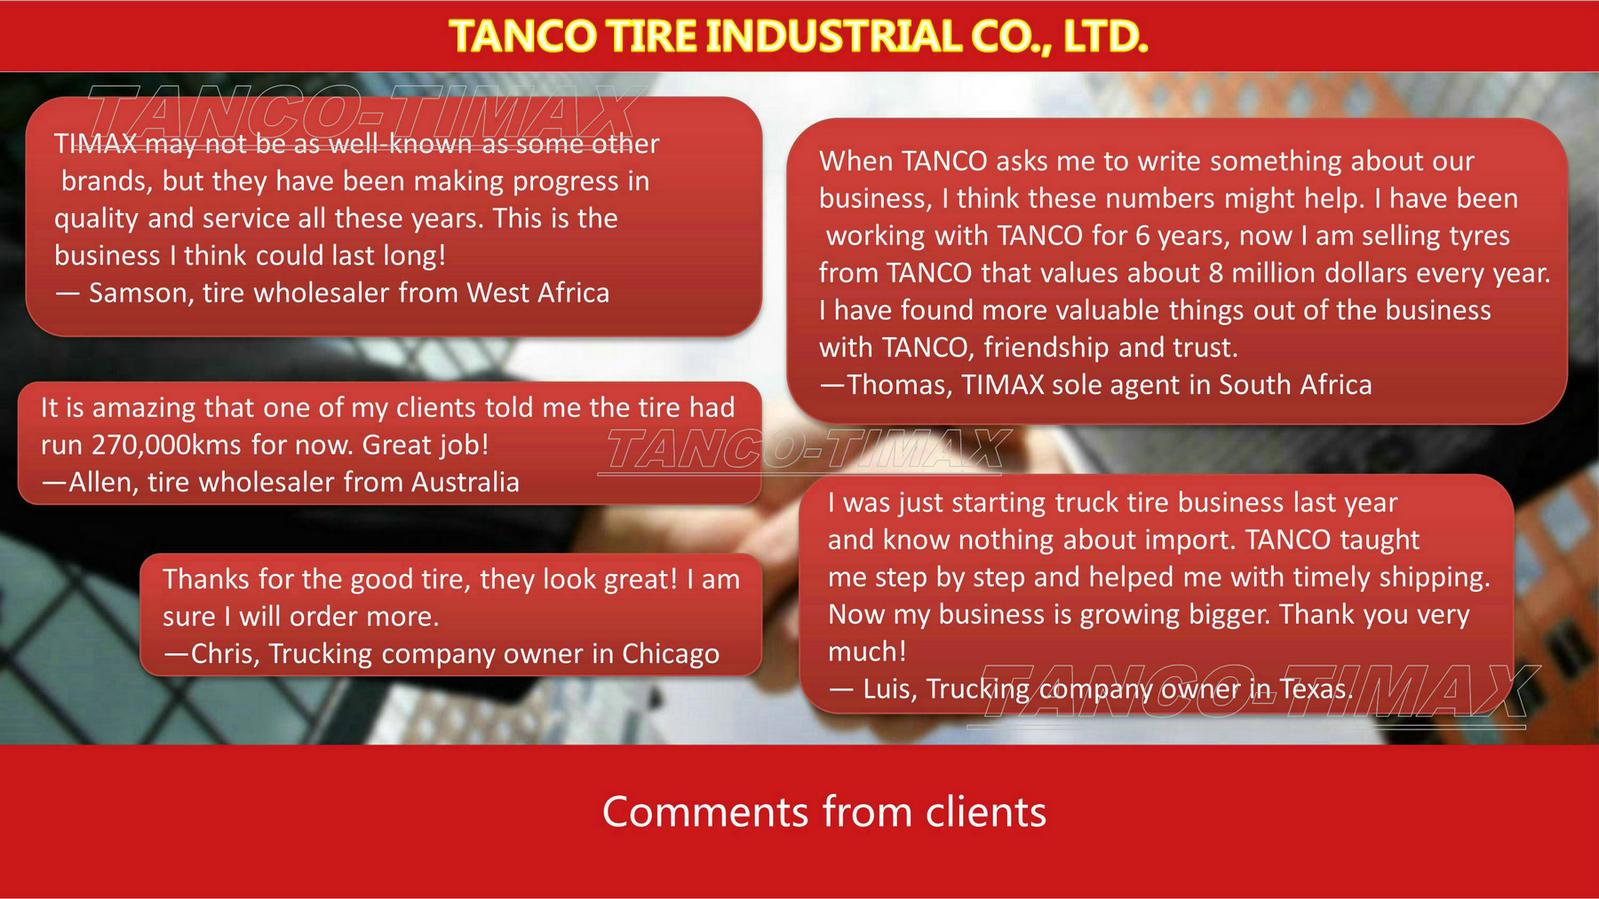 19. Clients' feedback